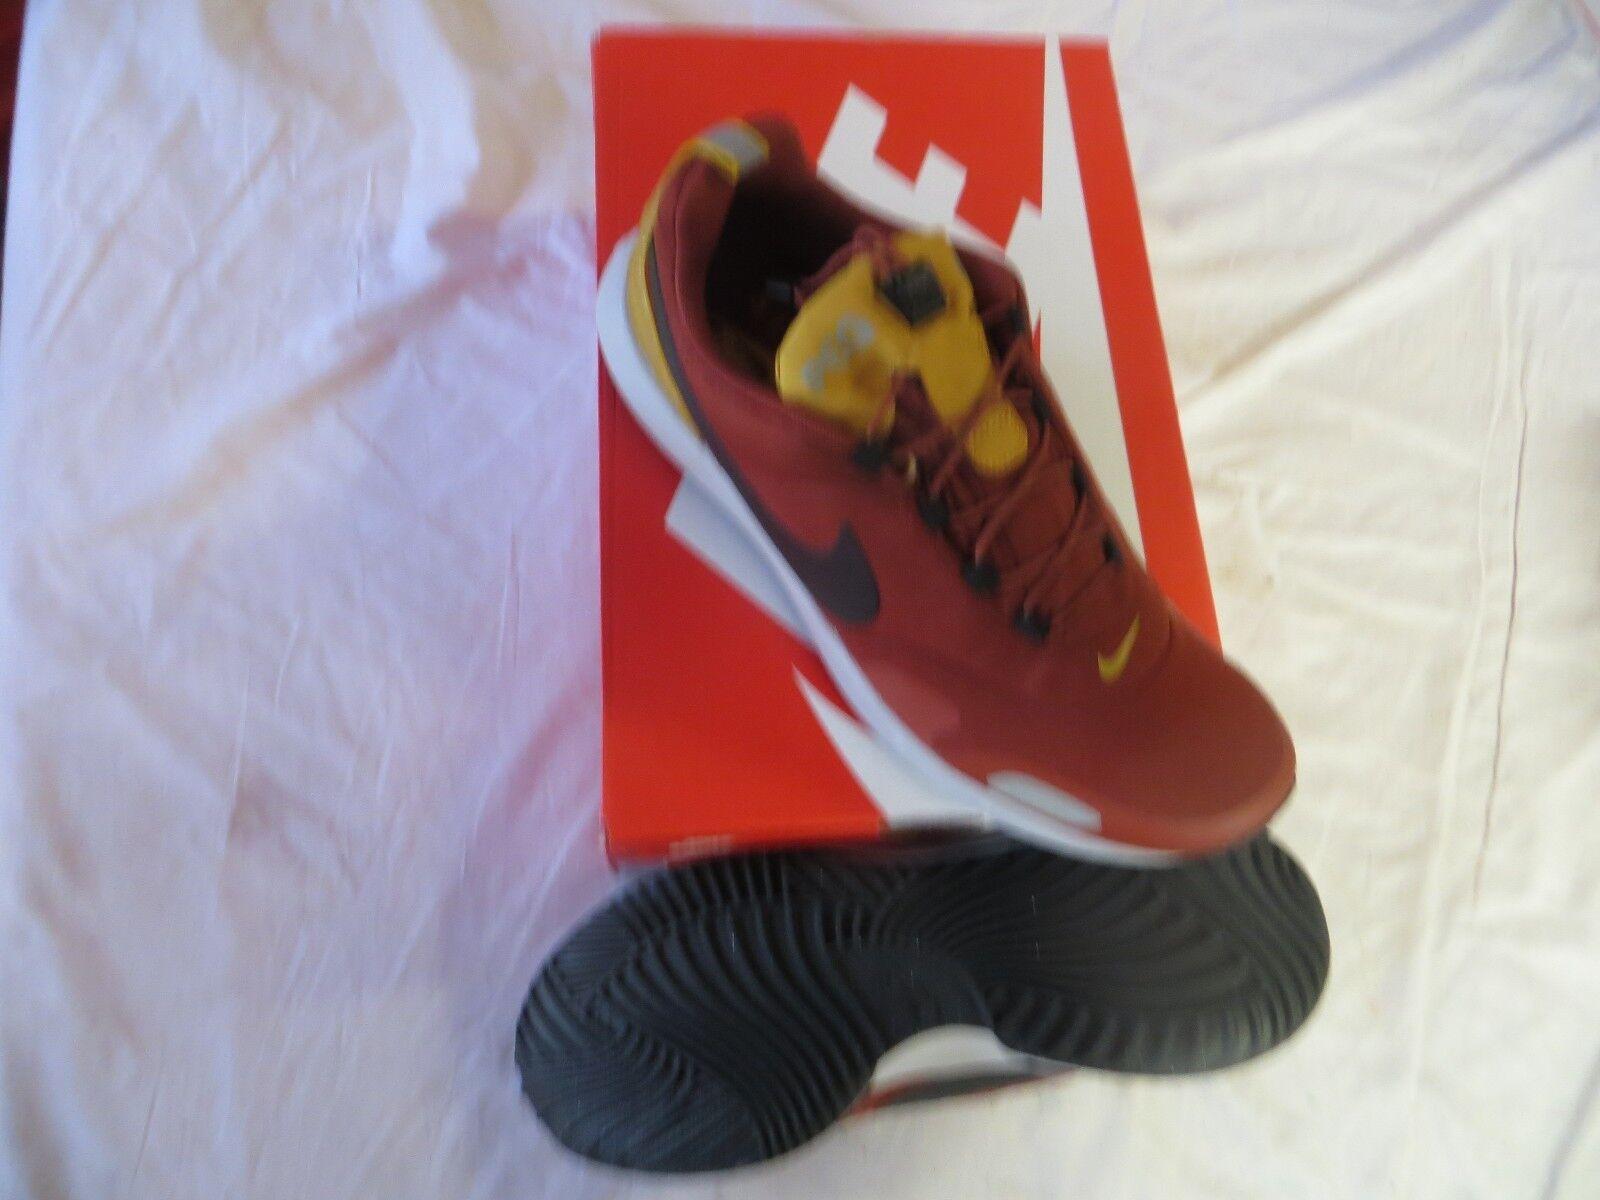 Nike men's air pegasus A/T Sz 12 Mars Stone/Black Price reduction Retail Price reduction Seasonal clearance sale